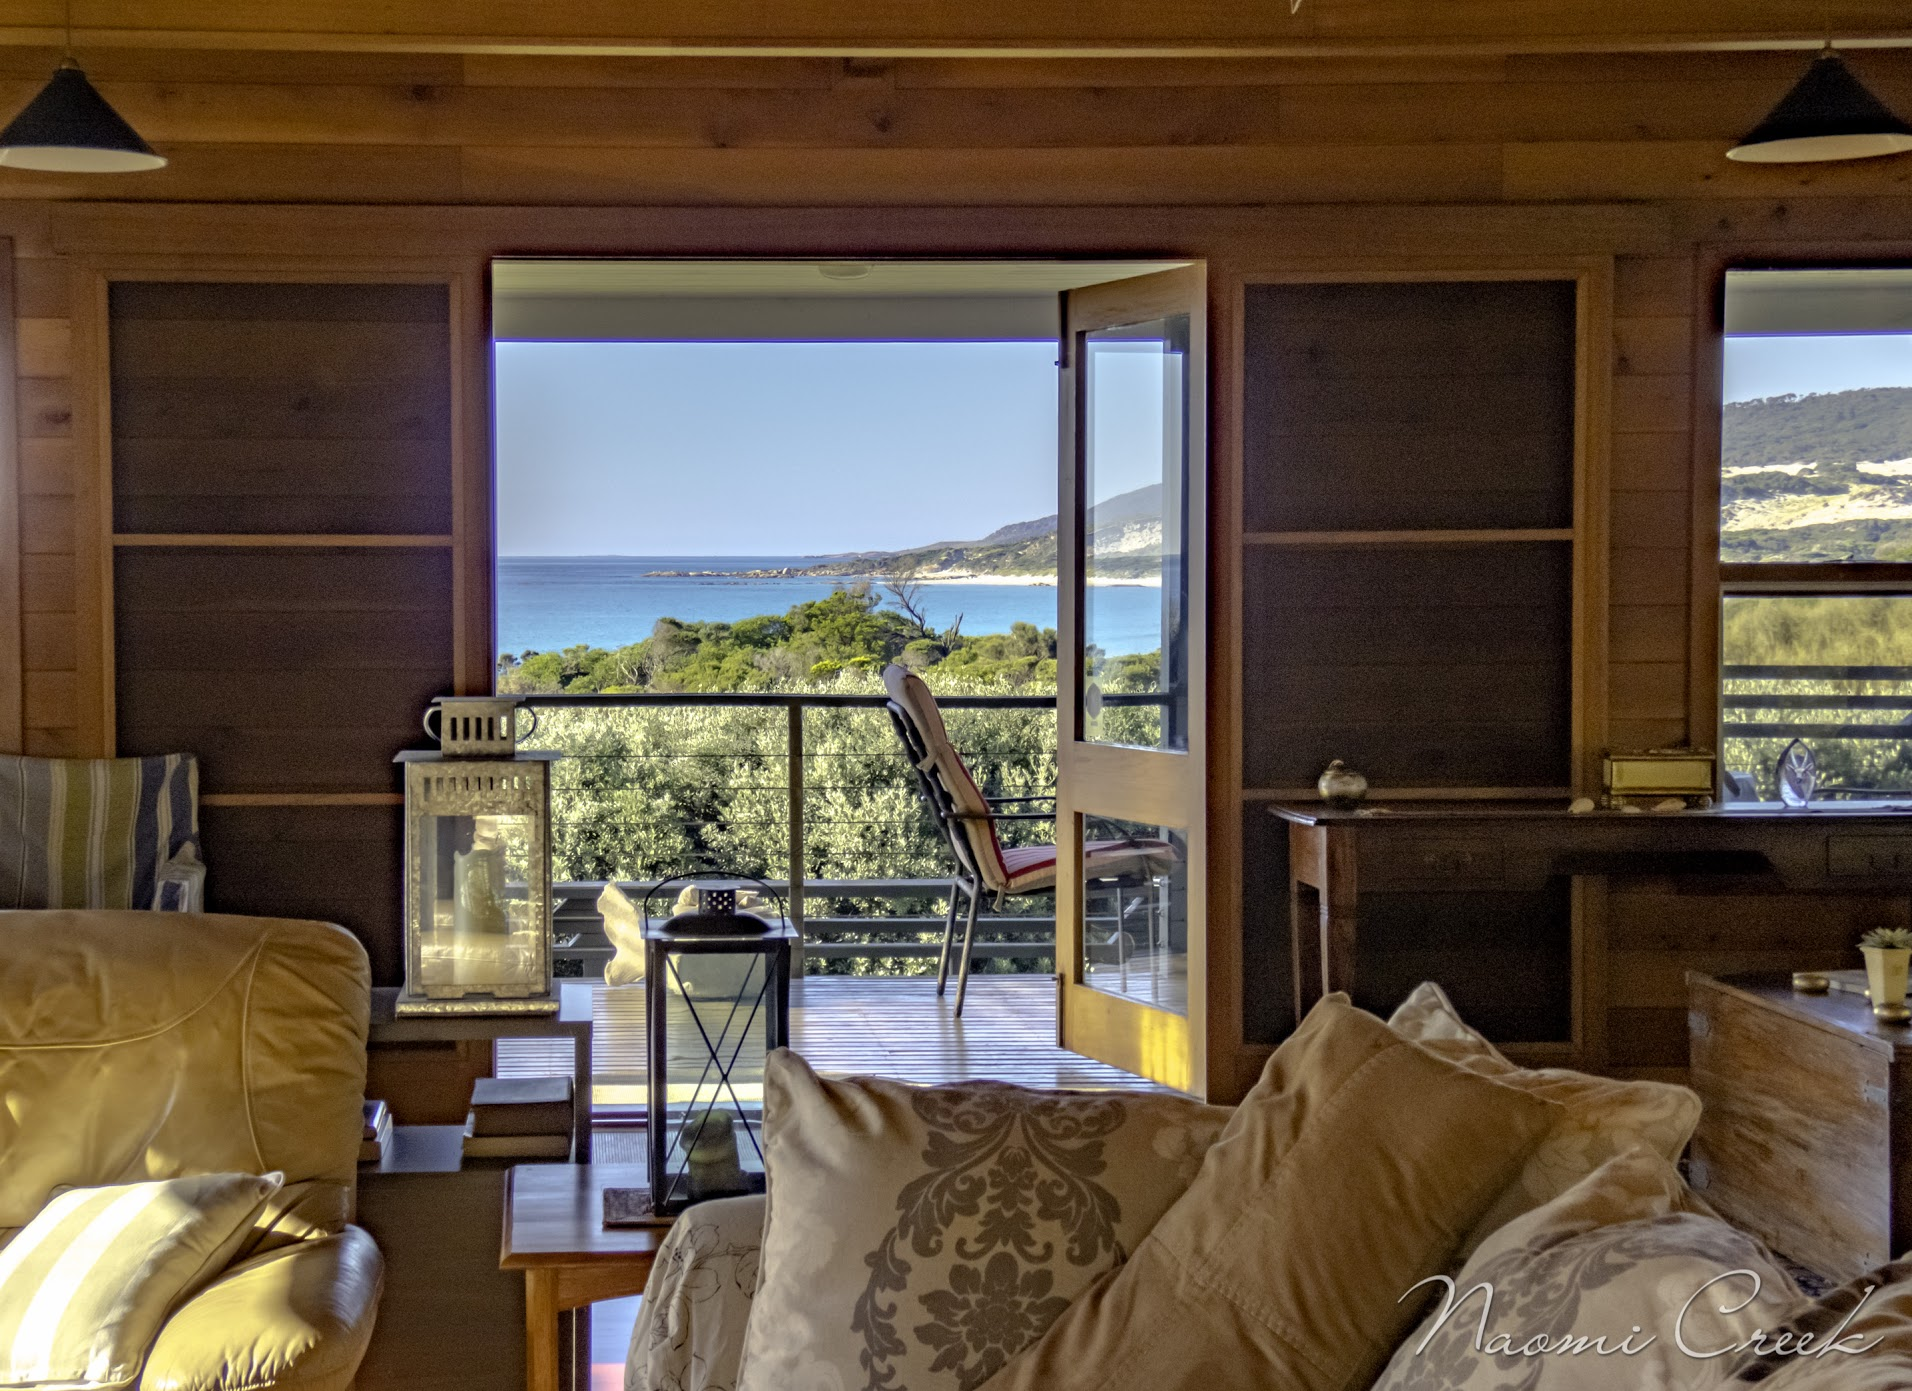 Palana Beach House has uninterrupted sea views